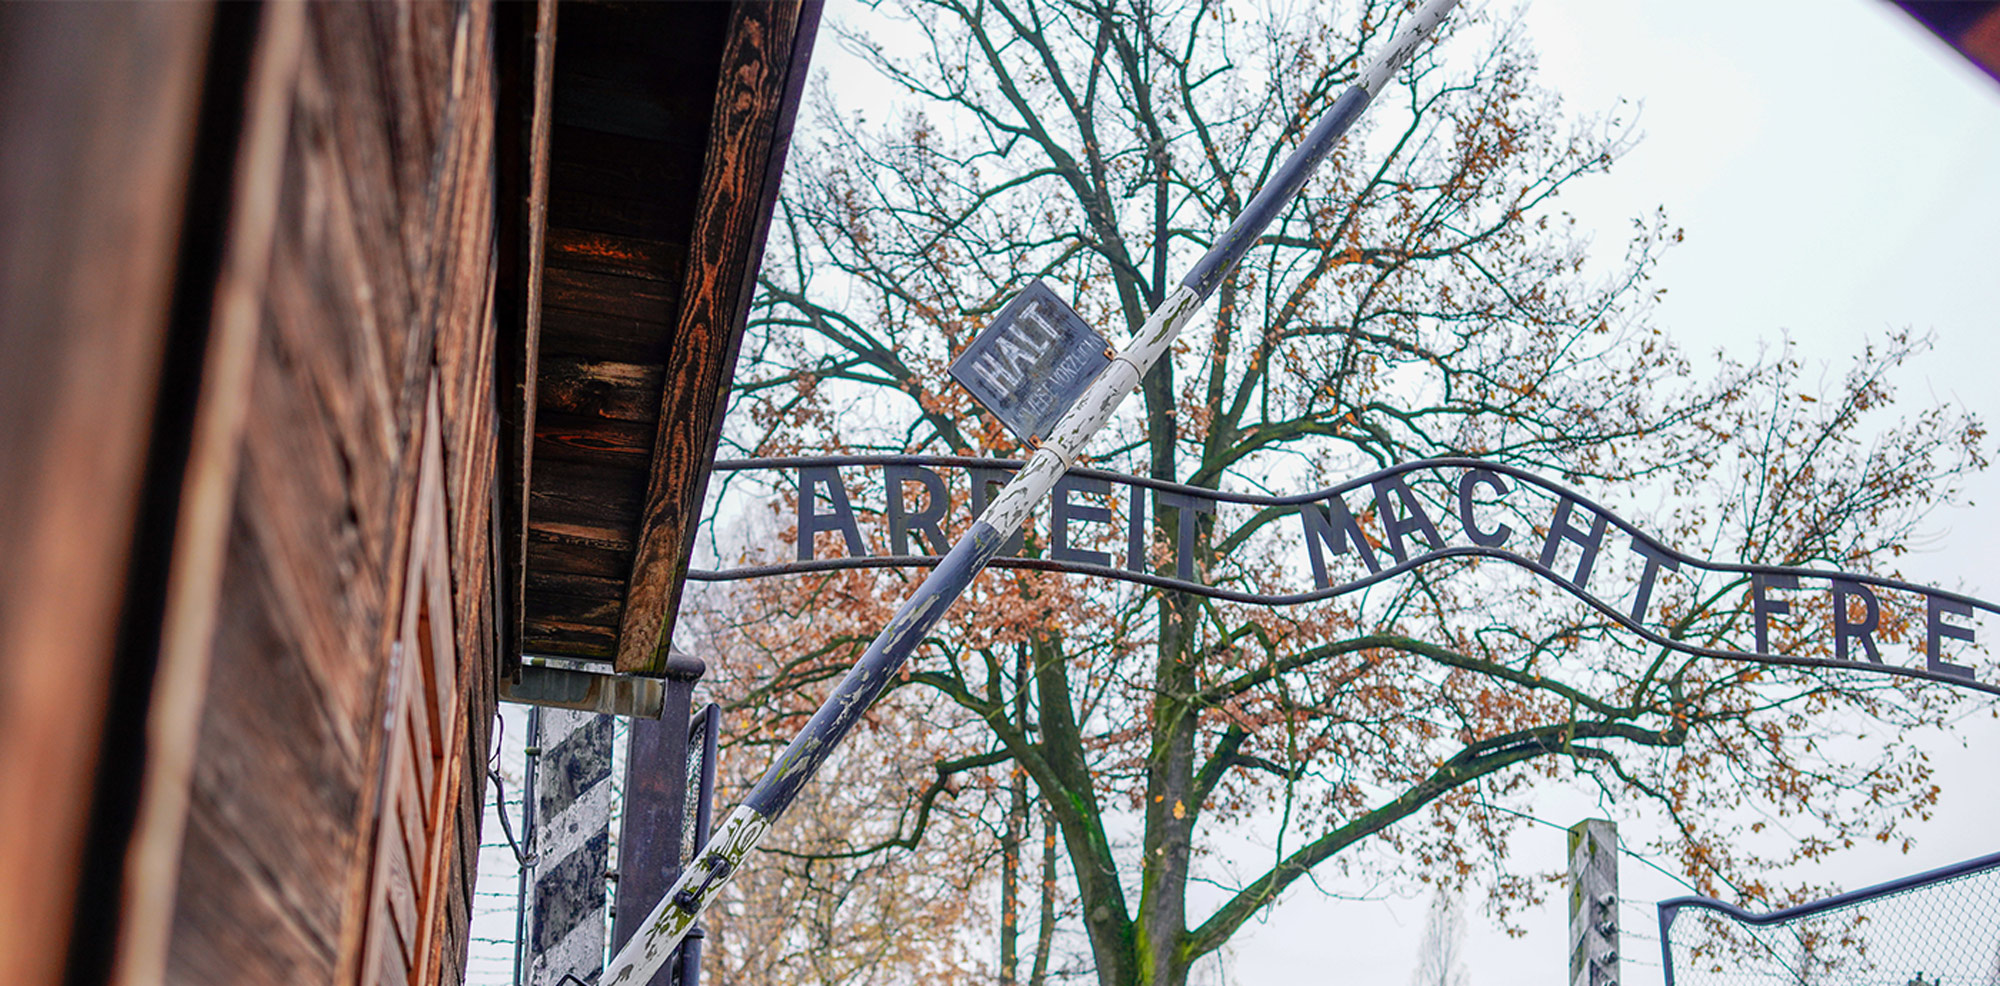 Auschwitz Concentration Camp in Oswieciem Poland